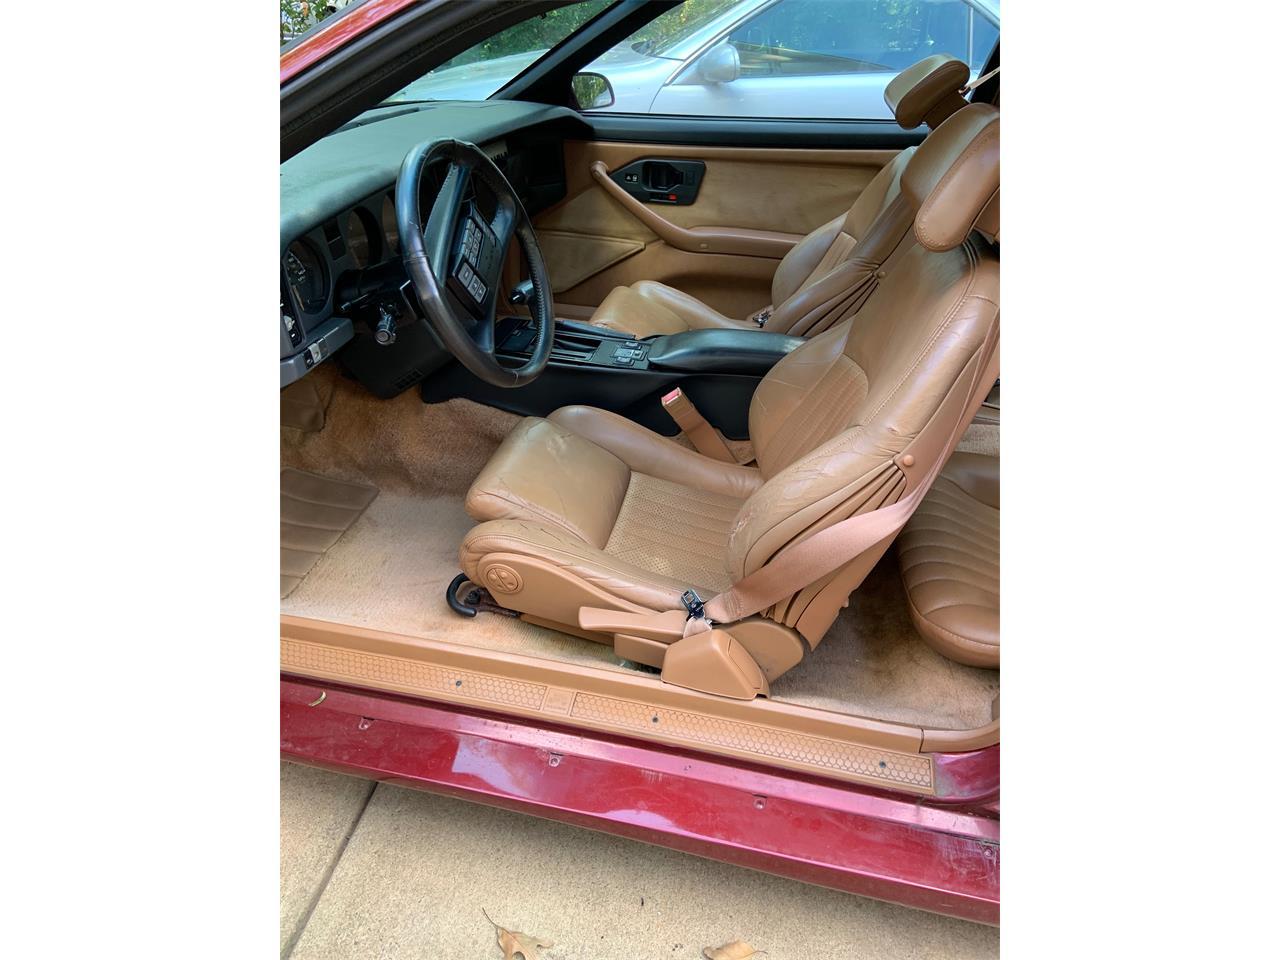 1989 Pontiac Firebird Trans Am GTA (CC-1254467) for sale in Locust Grove, Virginia